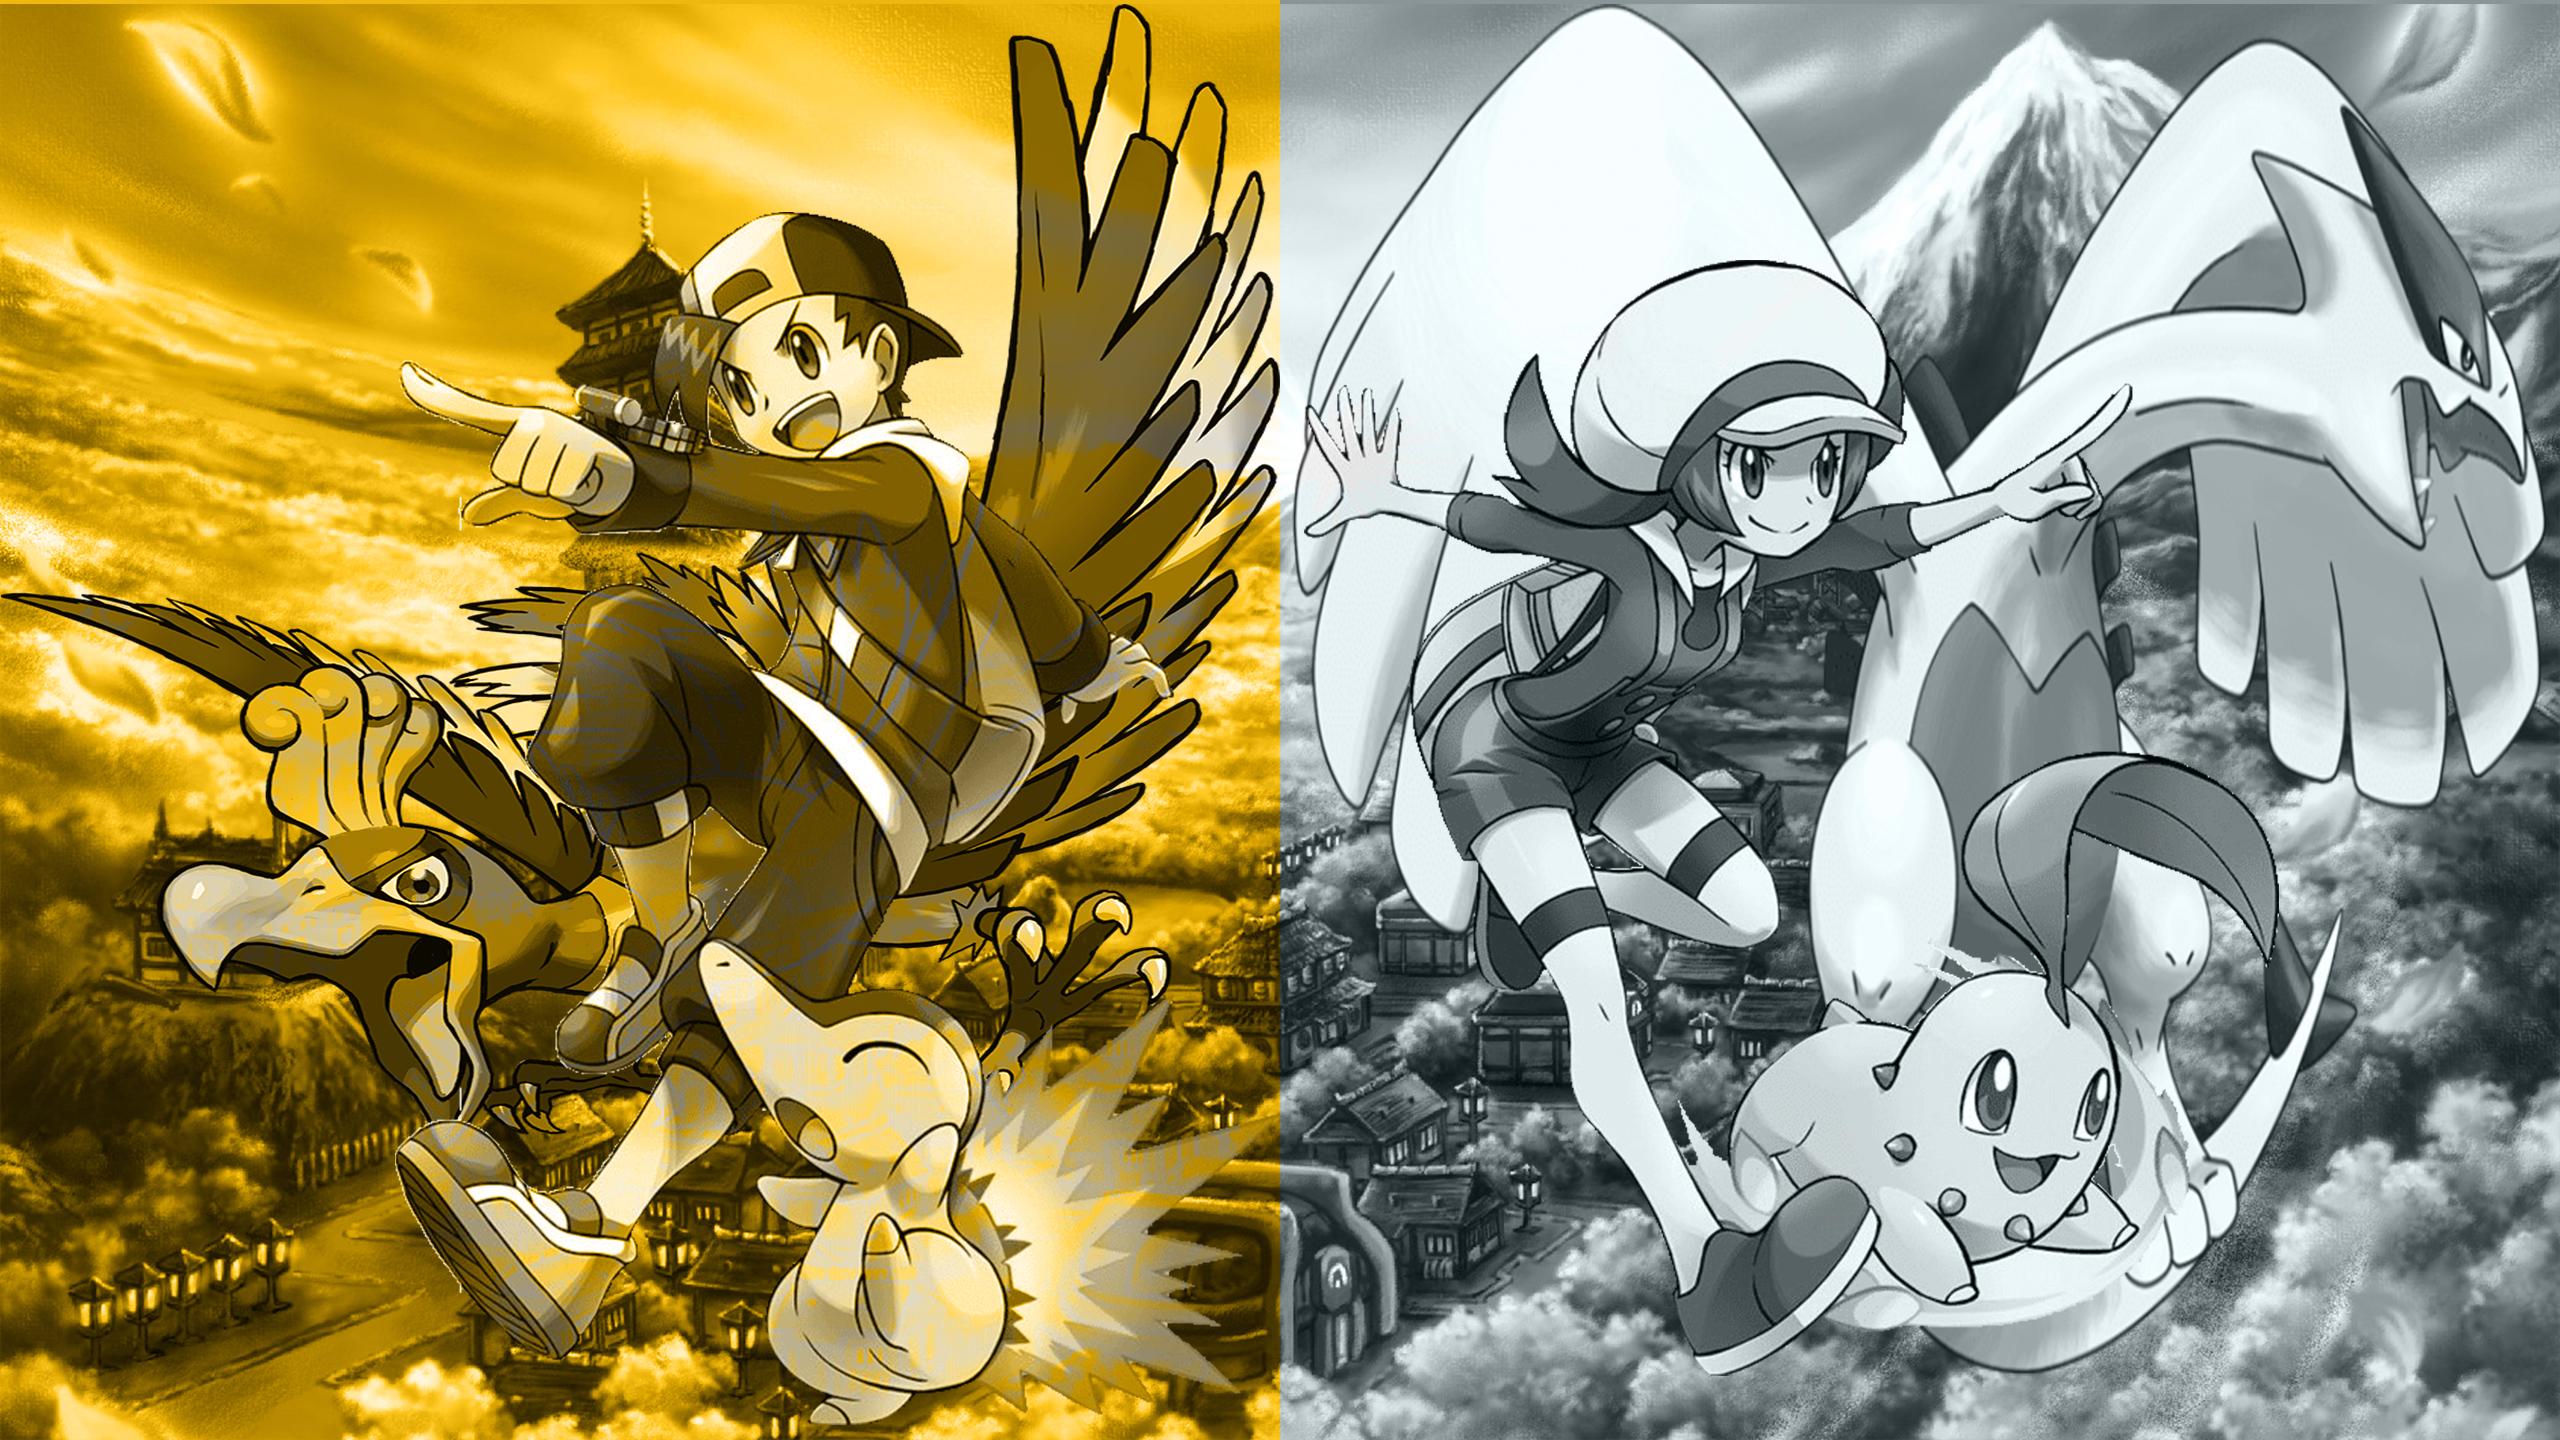 Pokemon Heartgold And Soulsilver Wallpaper By Sirgarchomp45 On Deviantart